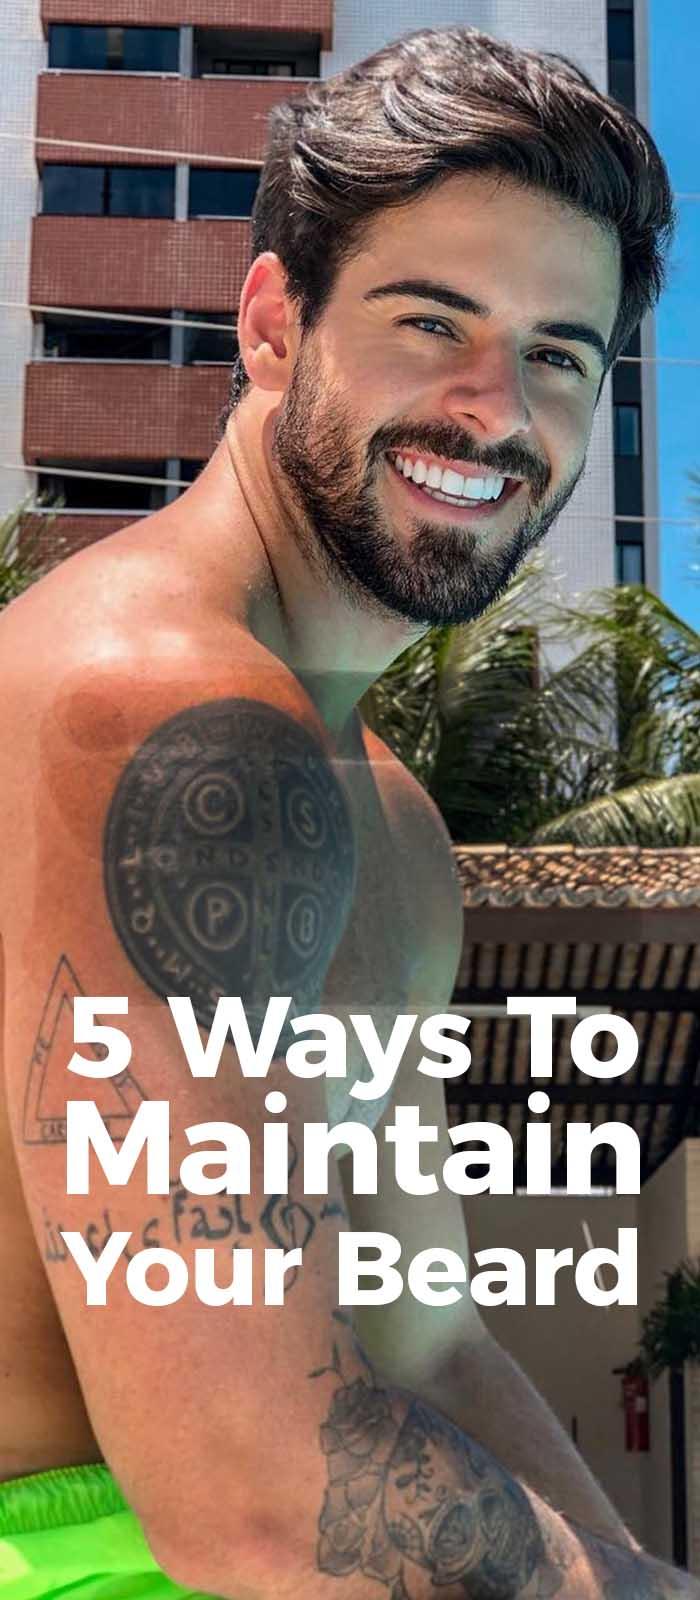 Ways To Maintain Your Beard